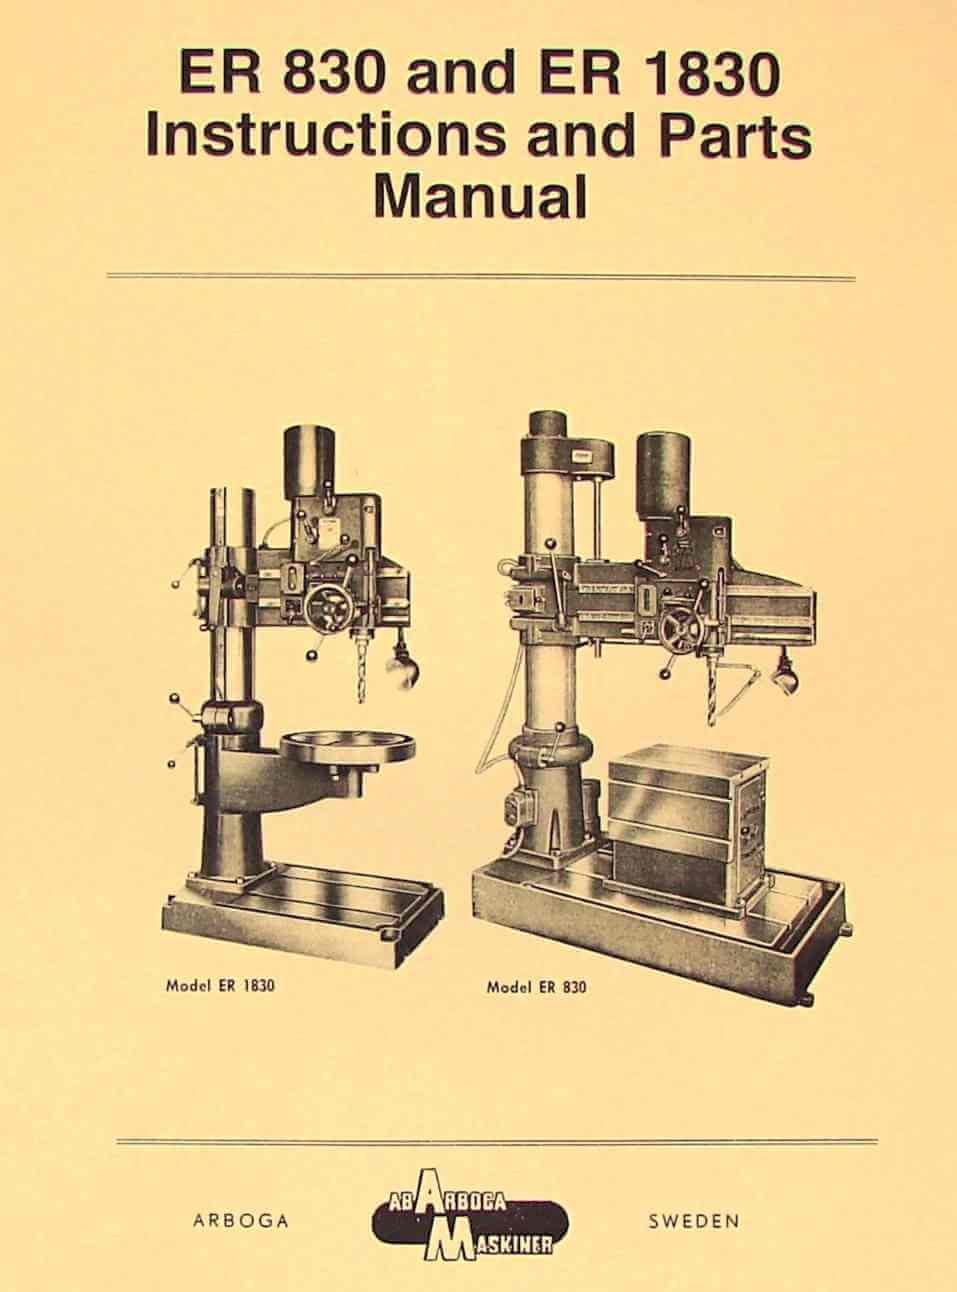 Ab Arboga Maskiner Er 830 1830 Radial Drill Instructions Wiring Diagram Parts Manual Ozark Tool Manuals Books